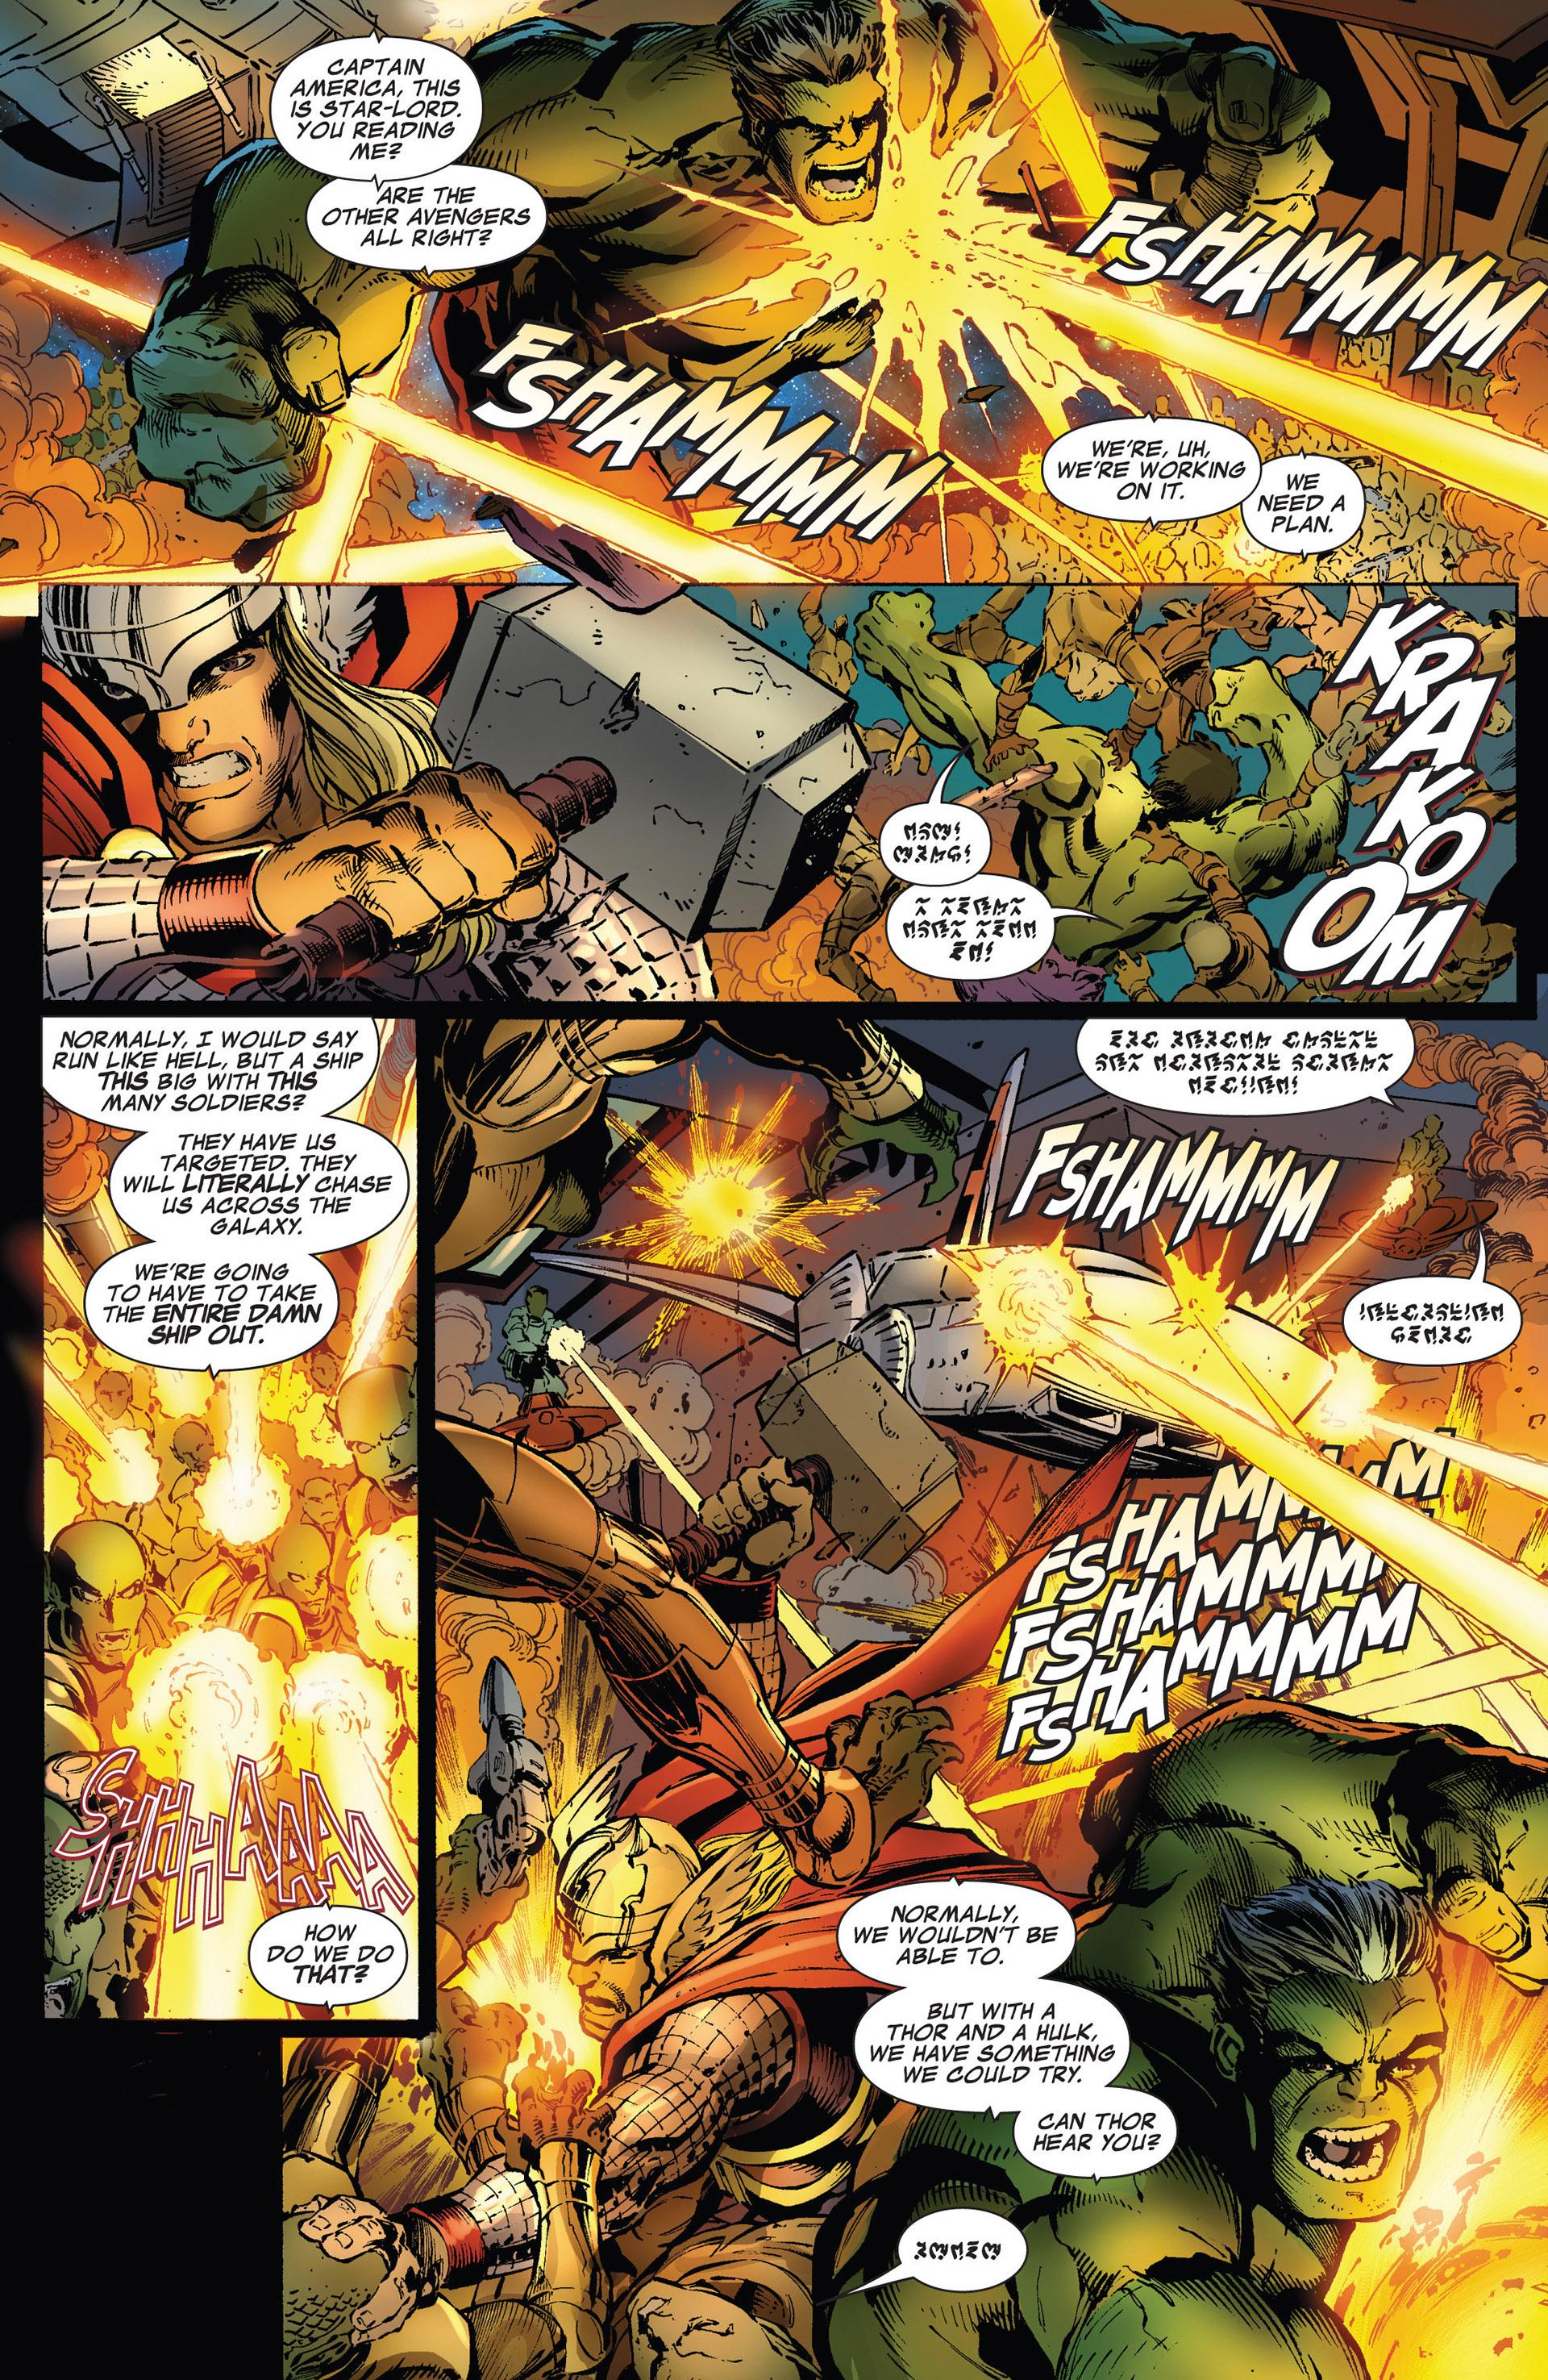 Avengers Assemble (2012) 7 Page 13